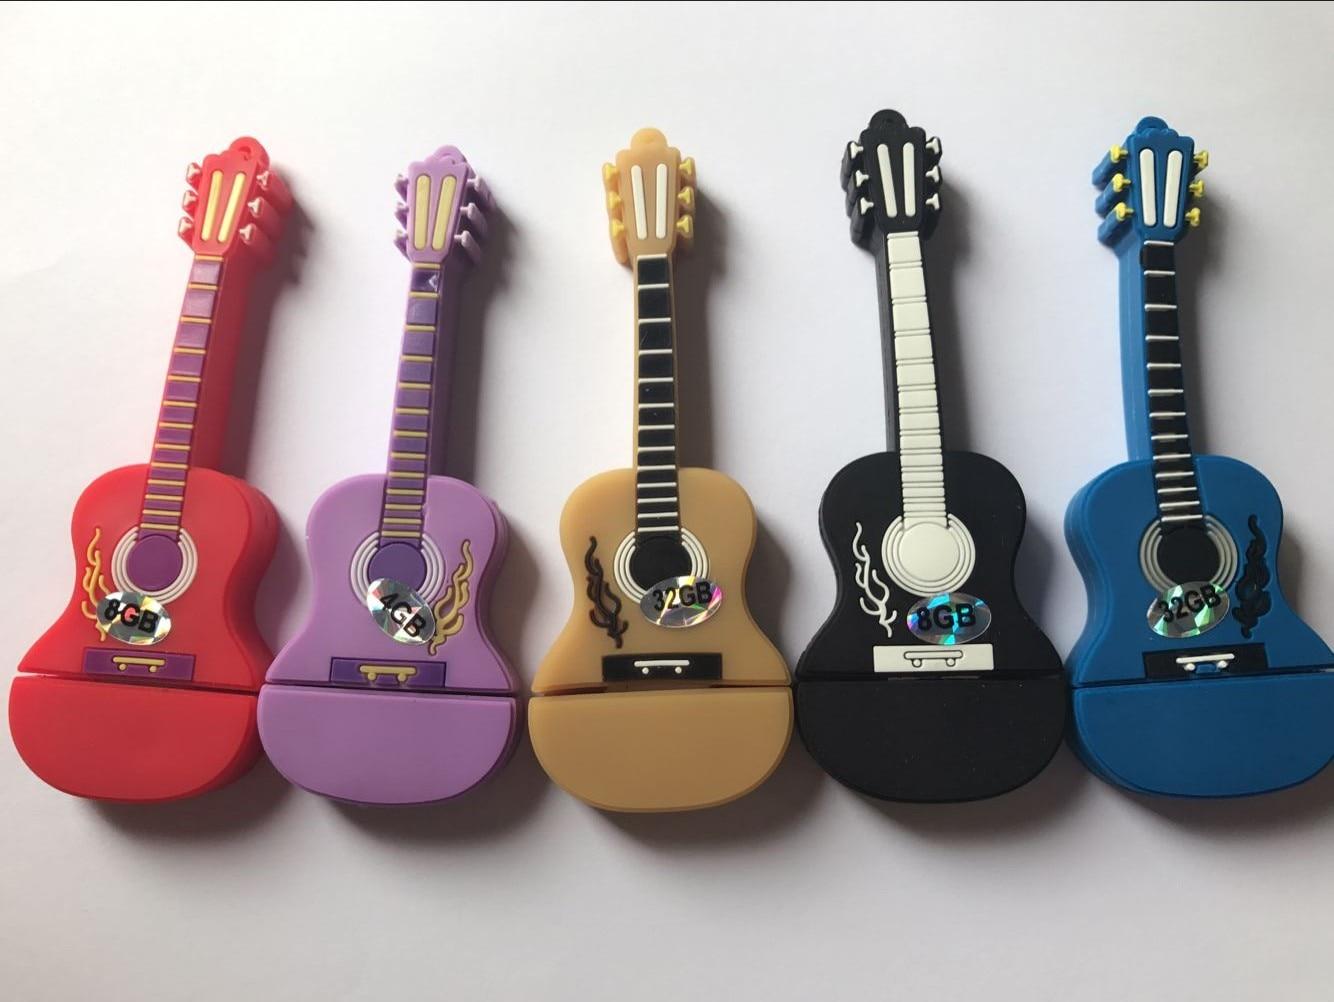 100% real capacity Musical Instrument Guitar Usb Flash Drive / Usb Memory Stick 16GB 32GB,Flash Memory Stick Pen Drive Disk S331